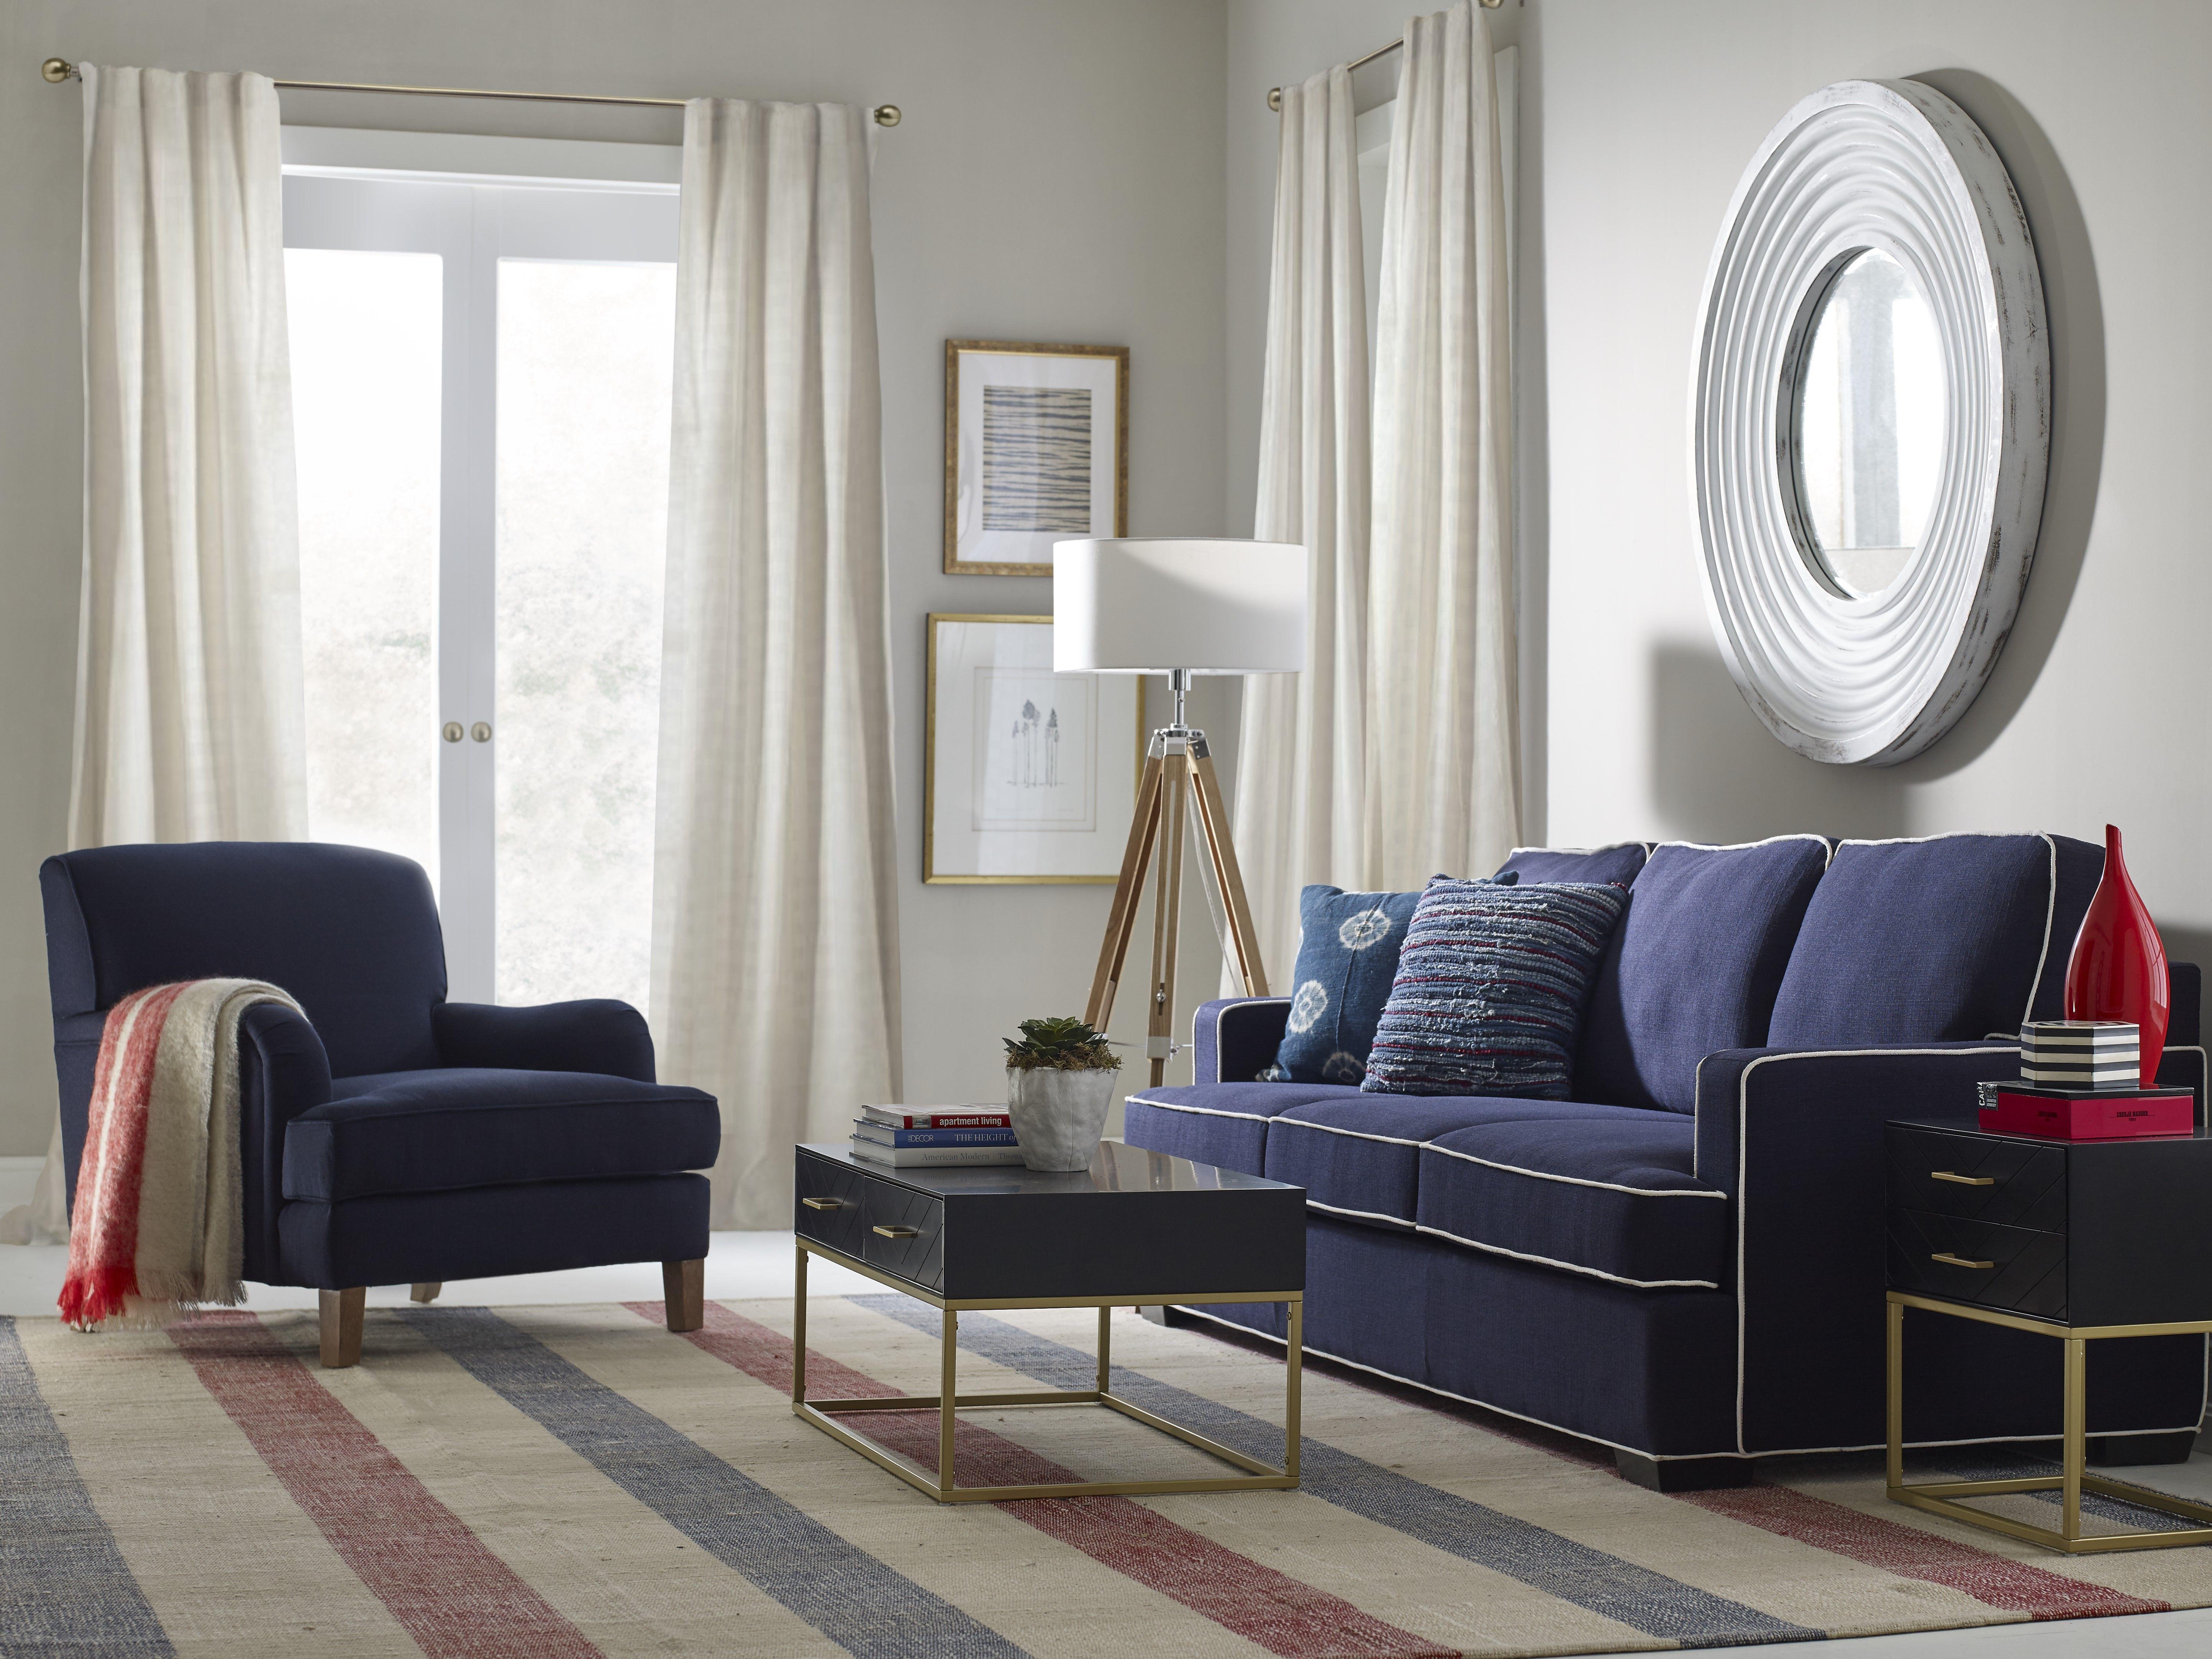 Cardiff 87 5 Recessed Arm Sofa Living Room Sets Furniture Mid Century Modern Loveseat